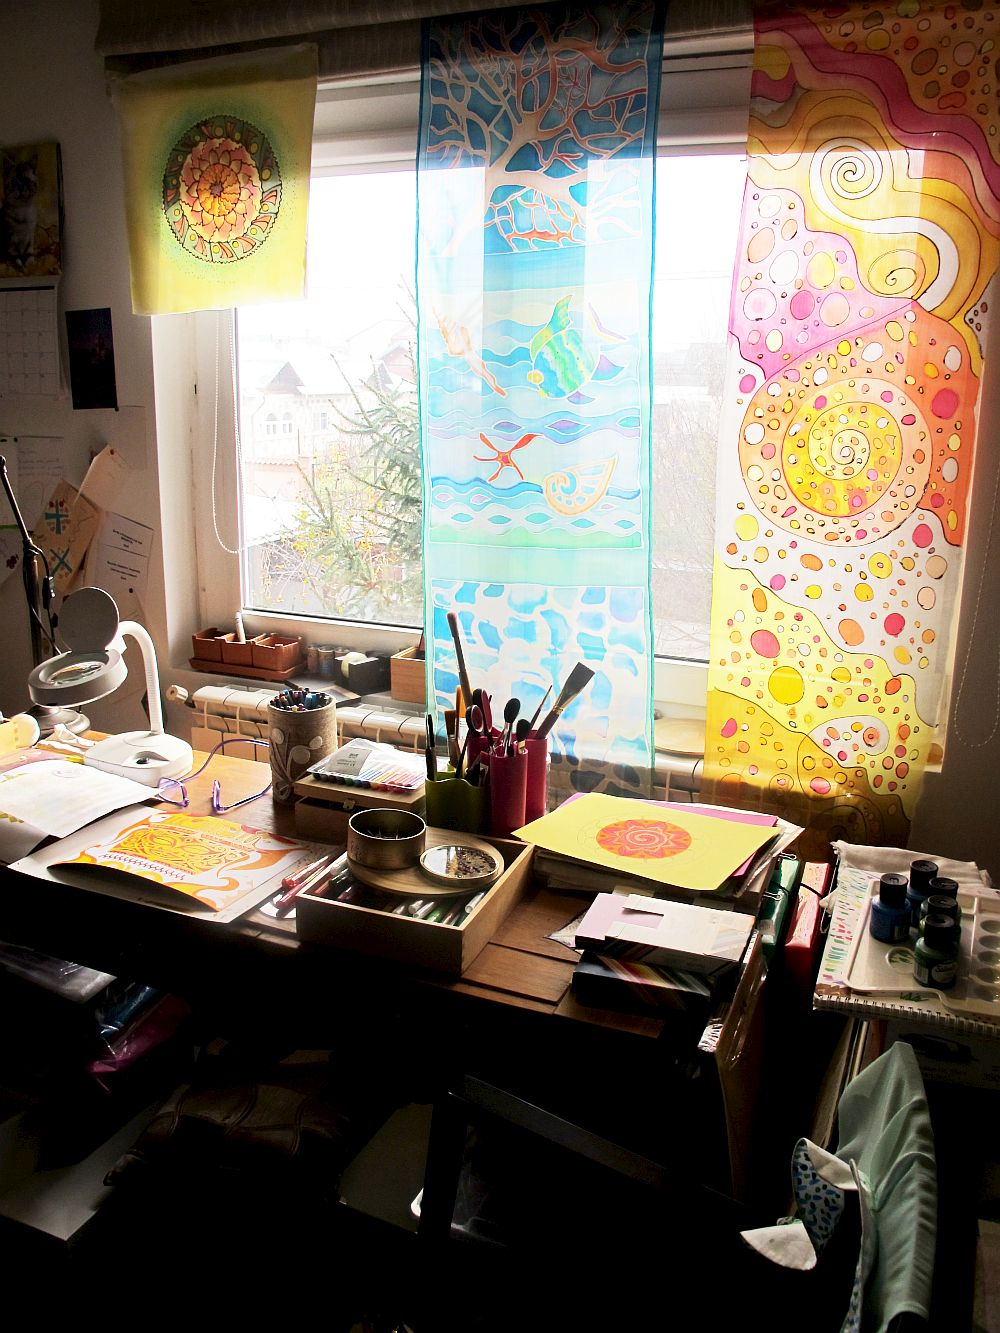 adelaparvu.com about Ioana Dominte artist (18)